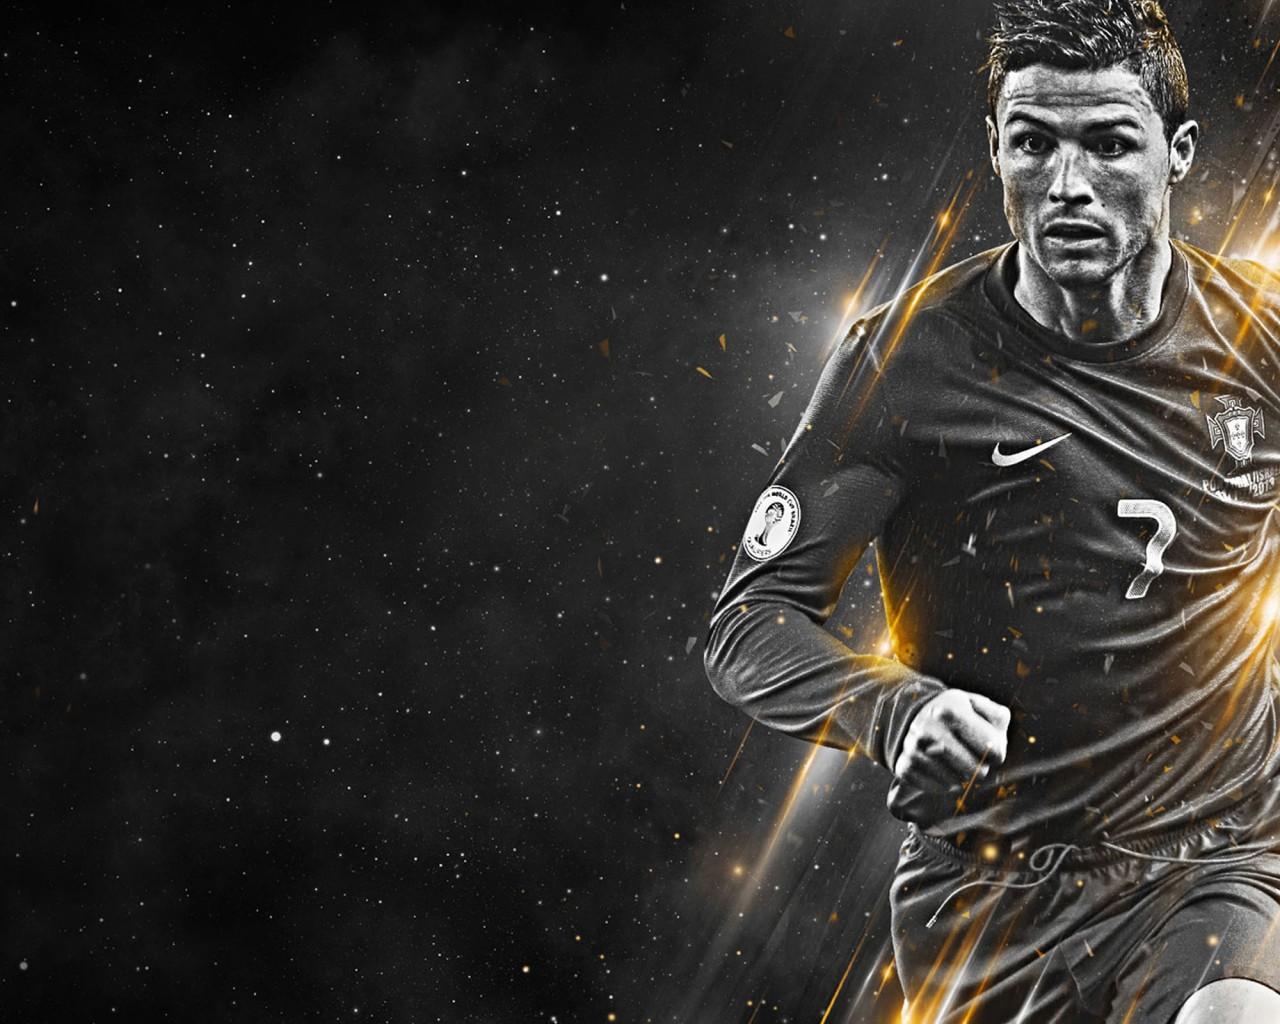 Nike Quotes Iphone Wallpaper Cristiano Ronaldo Black And White Wallpaper Cristiano